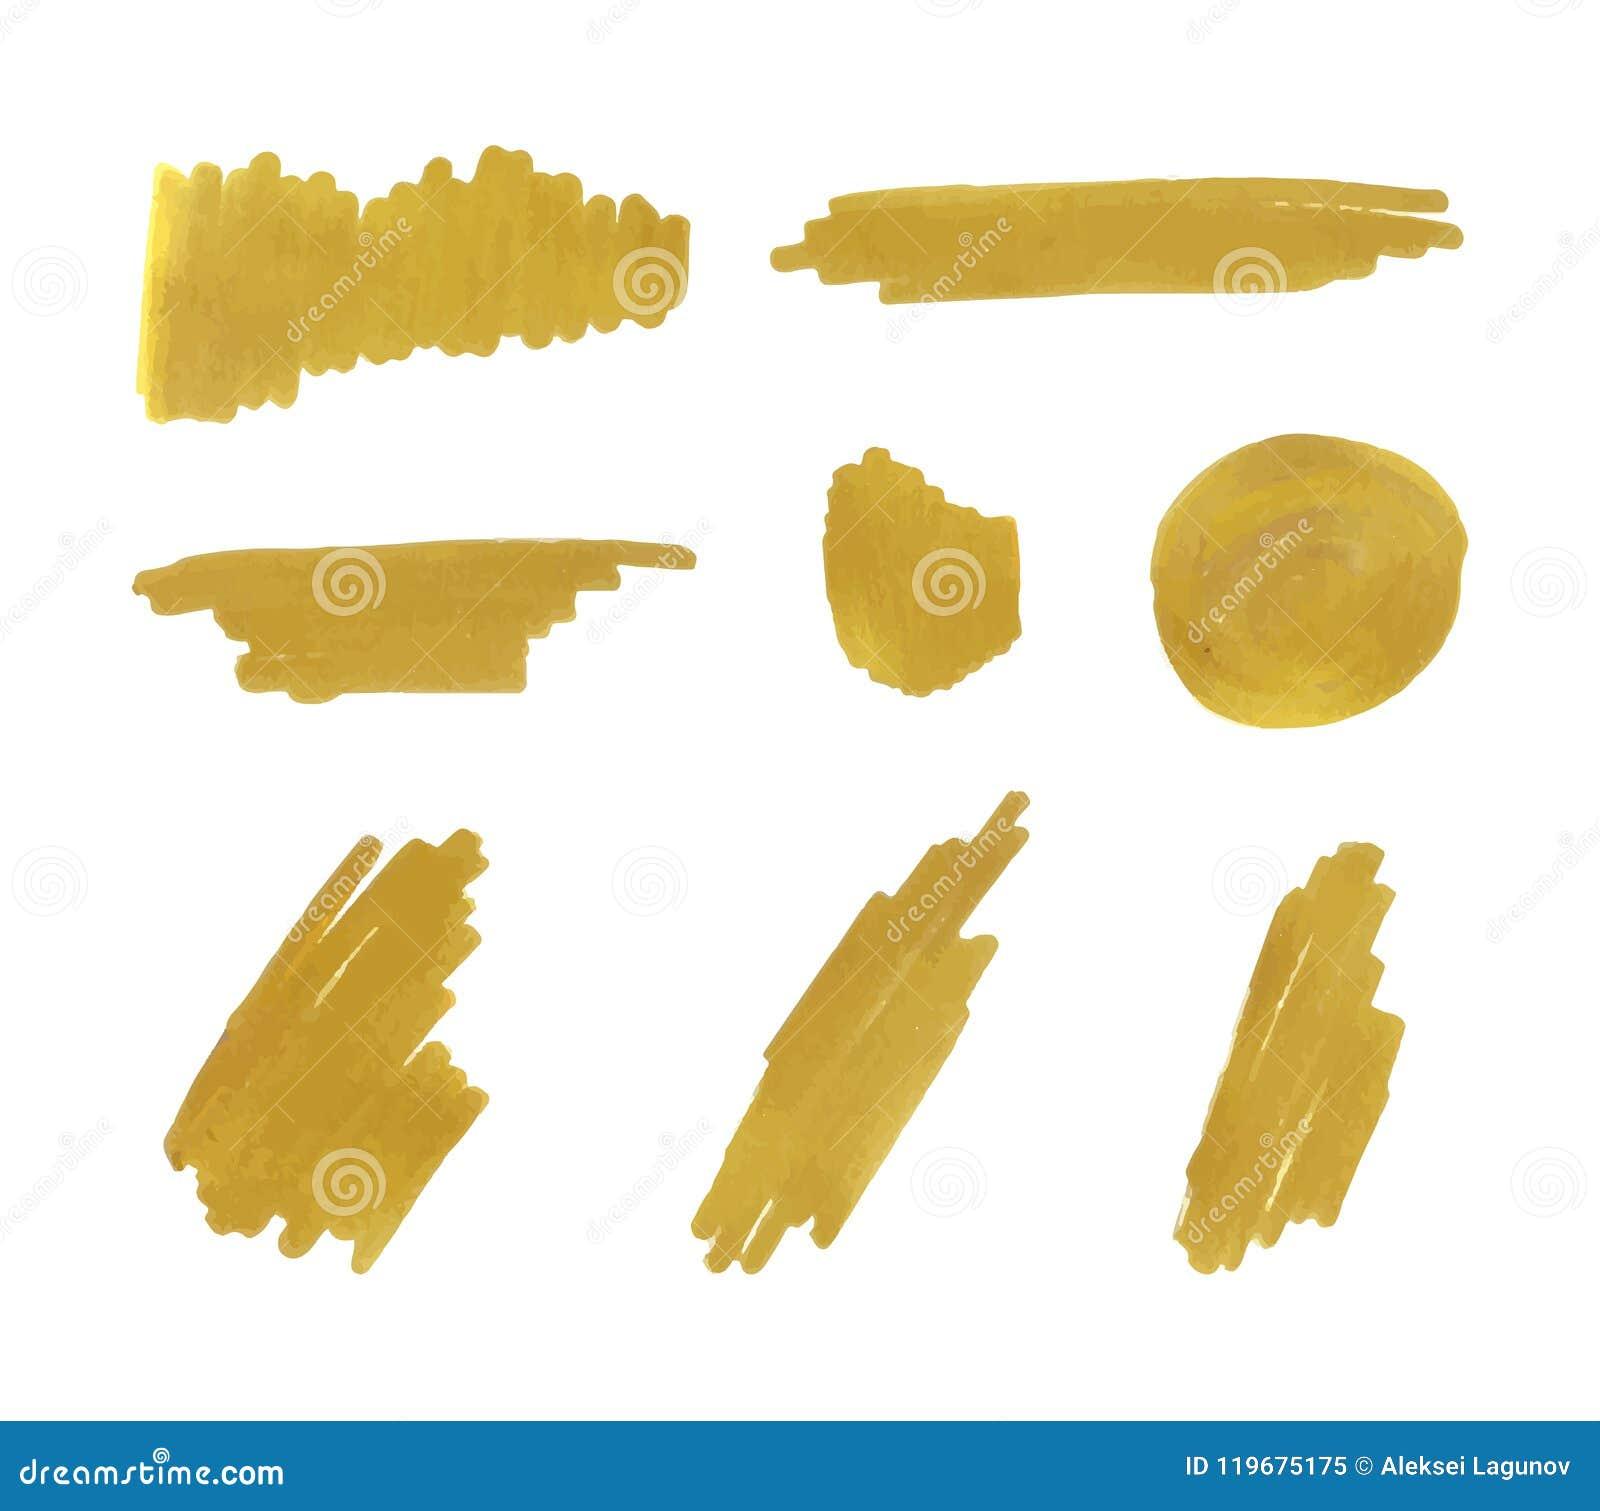 Vector Golden Marker Strokes Set, Background Gold Paint.